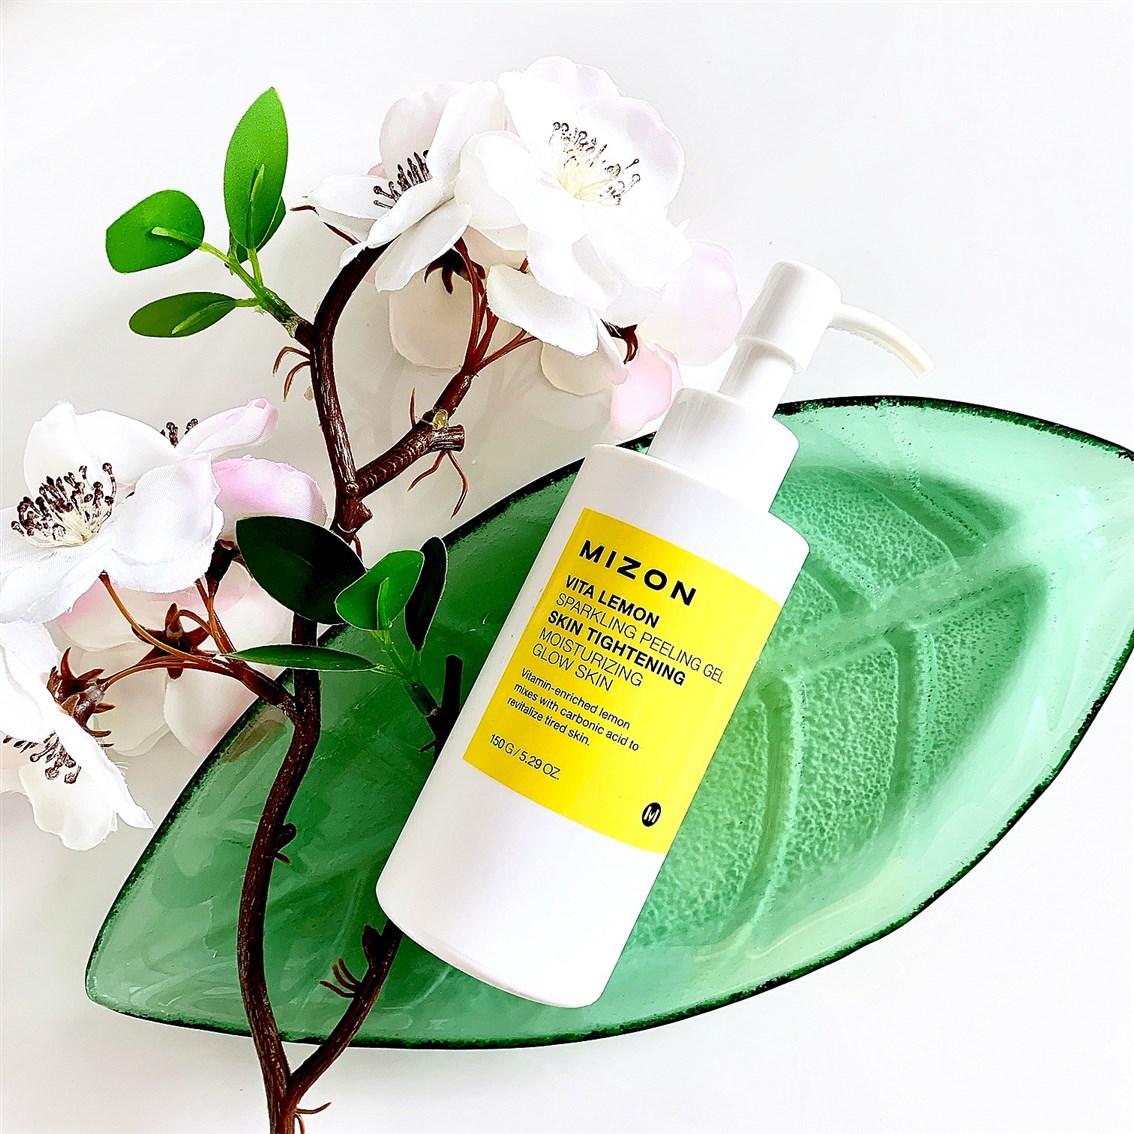 Mizon Vita Lemon Sparkling Peeling Gel opinie blog